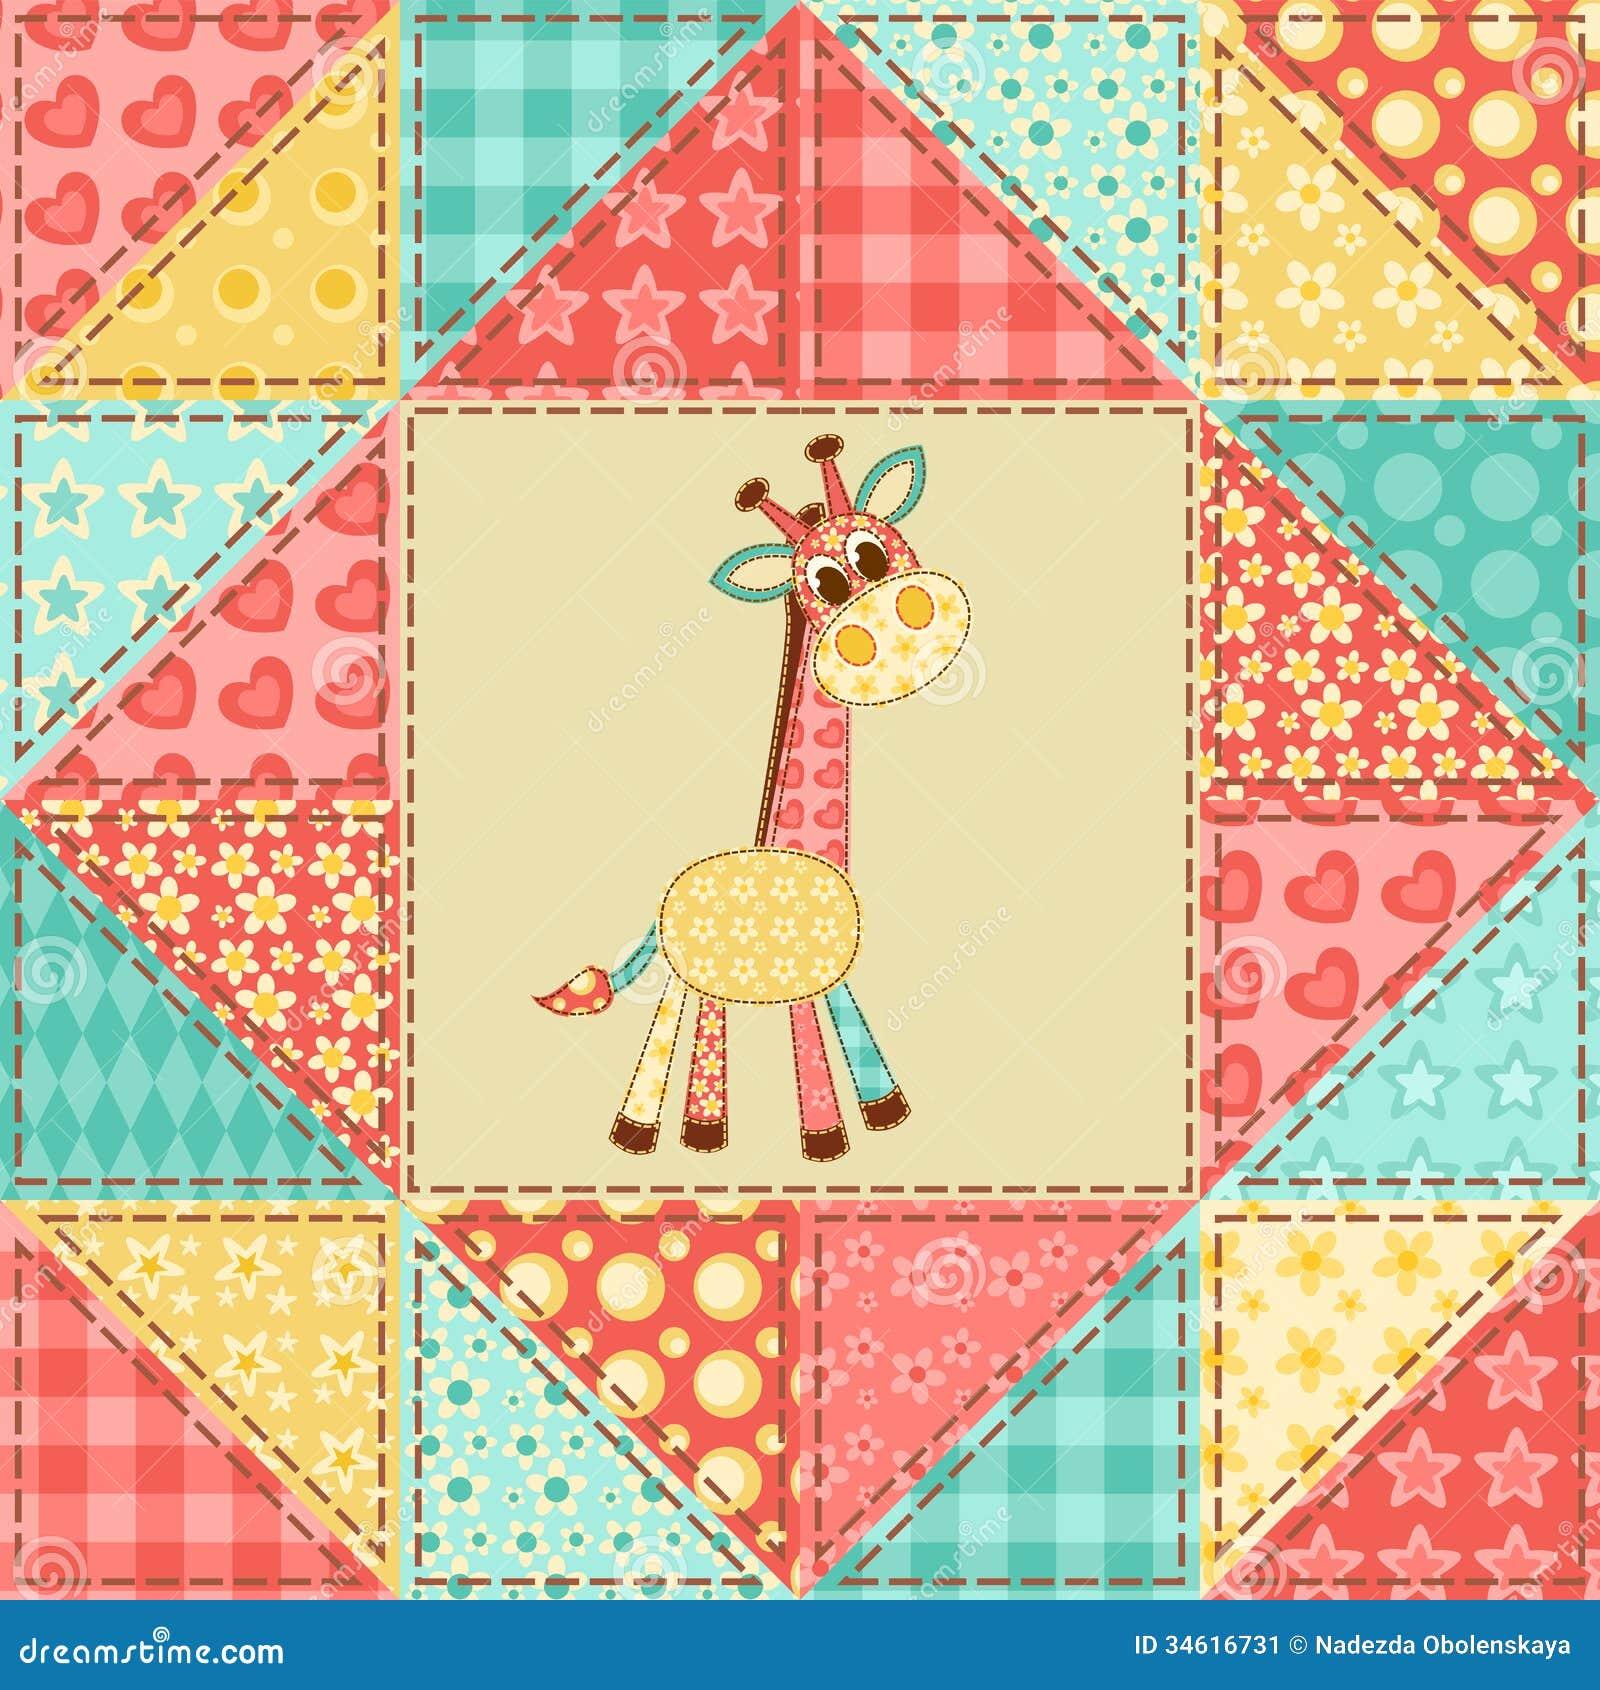 Giraffe Quilt Pattern Stock Image Image 34616731